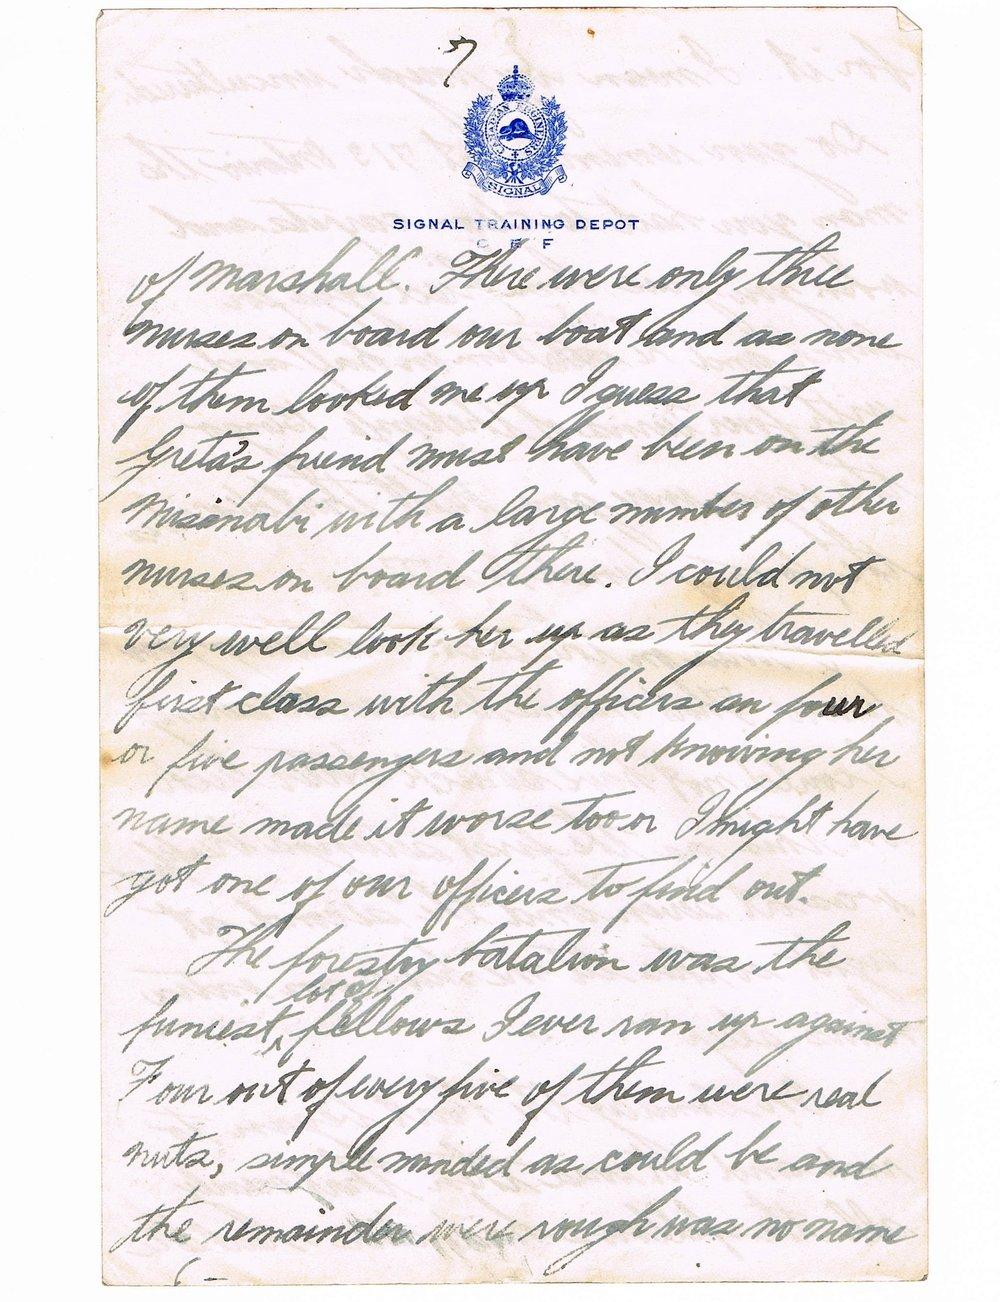 Basil Vale January 2, 1918 letter - page 7.jpg